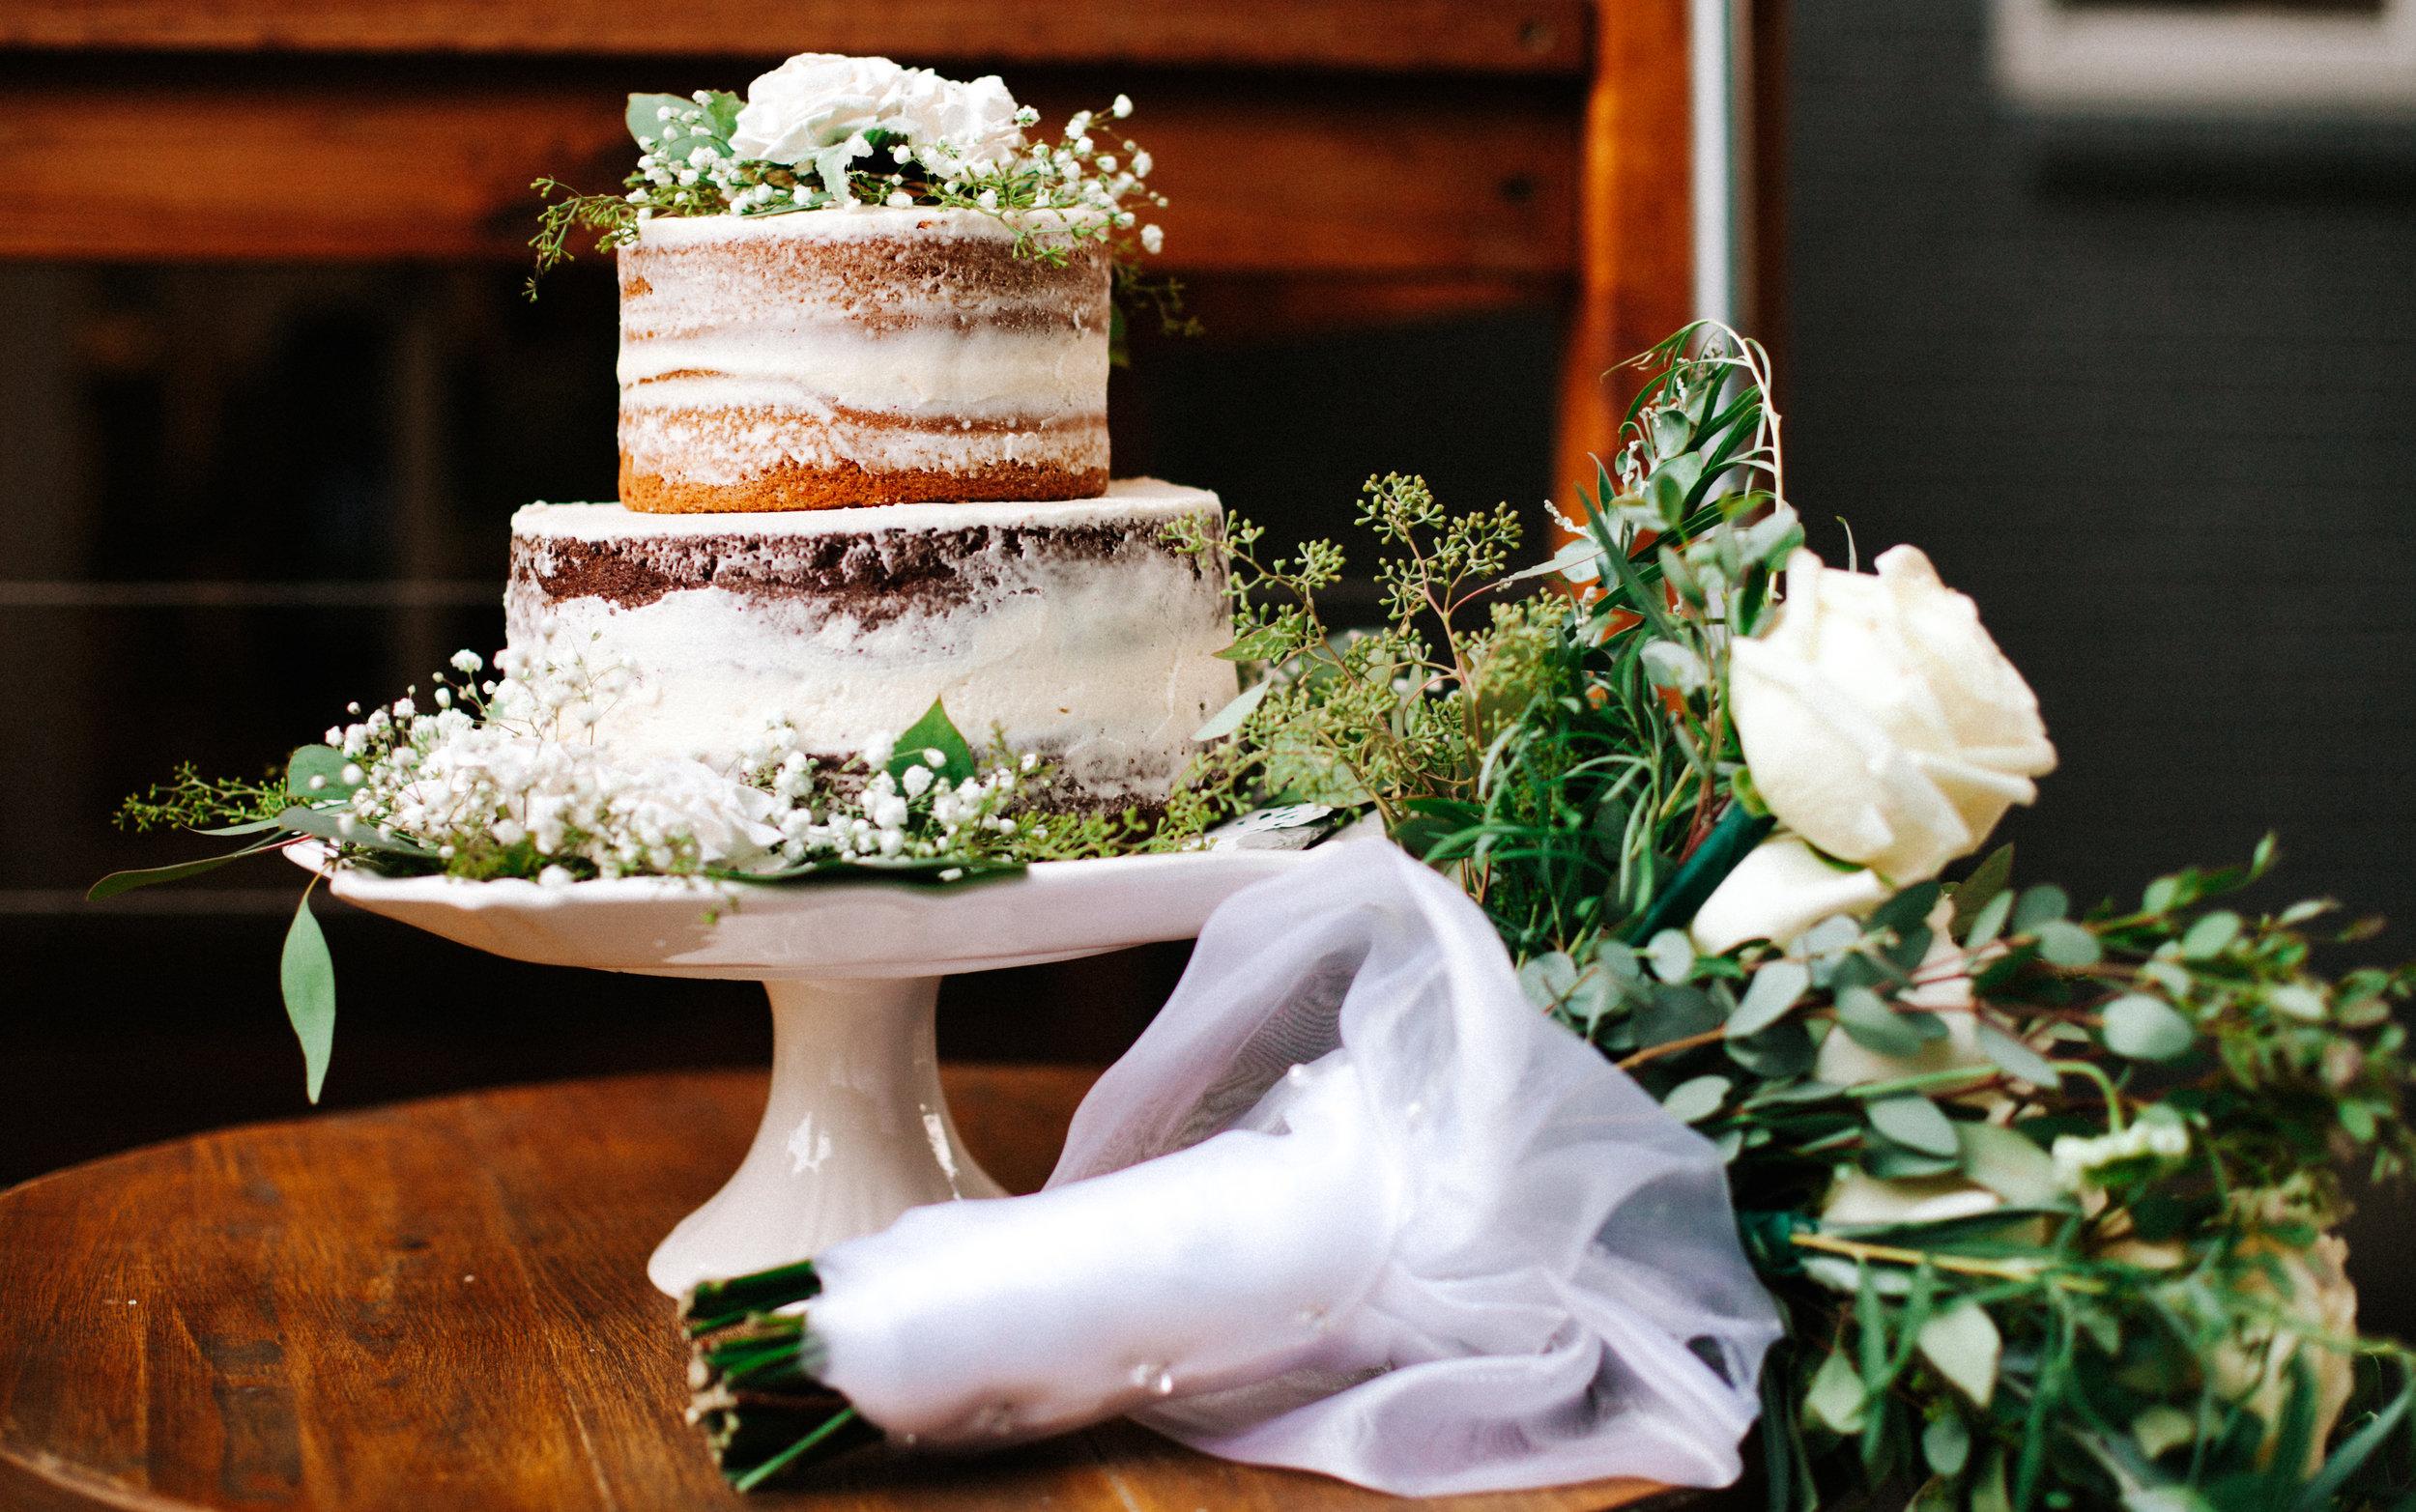 Salt Lake City Wedding - Salt Lake Wedding Photographer - Utah Wedding - Utah Wedding Photographer - SLC Wedding - SLC Wedding Photos - Murray UT Wedding-9991.jpg